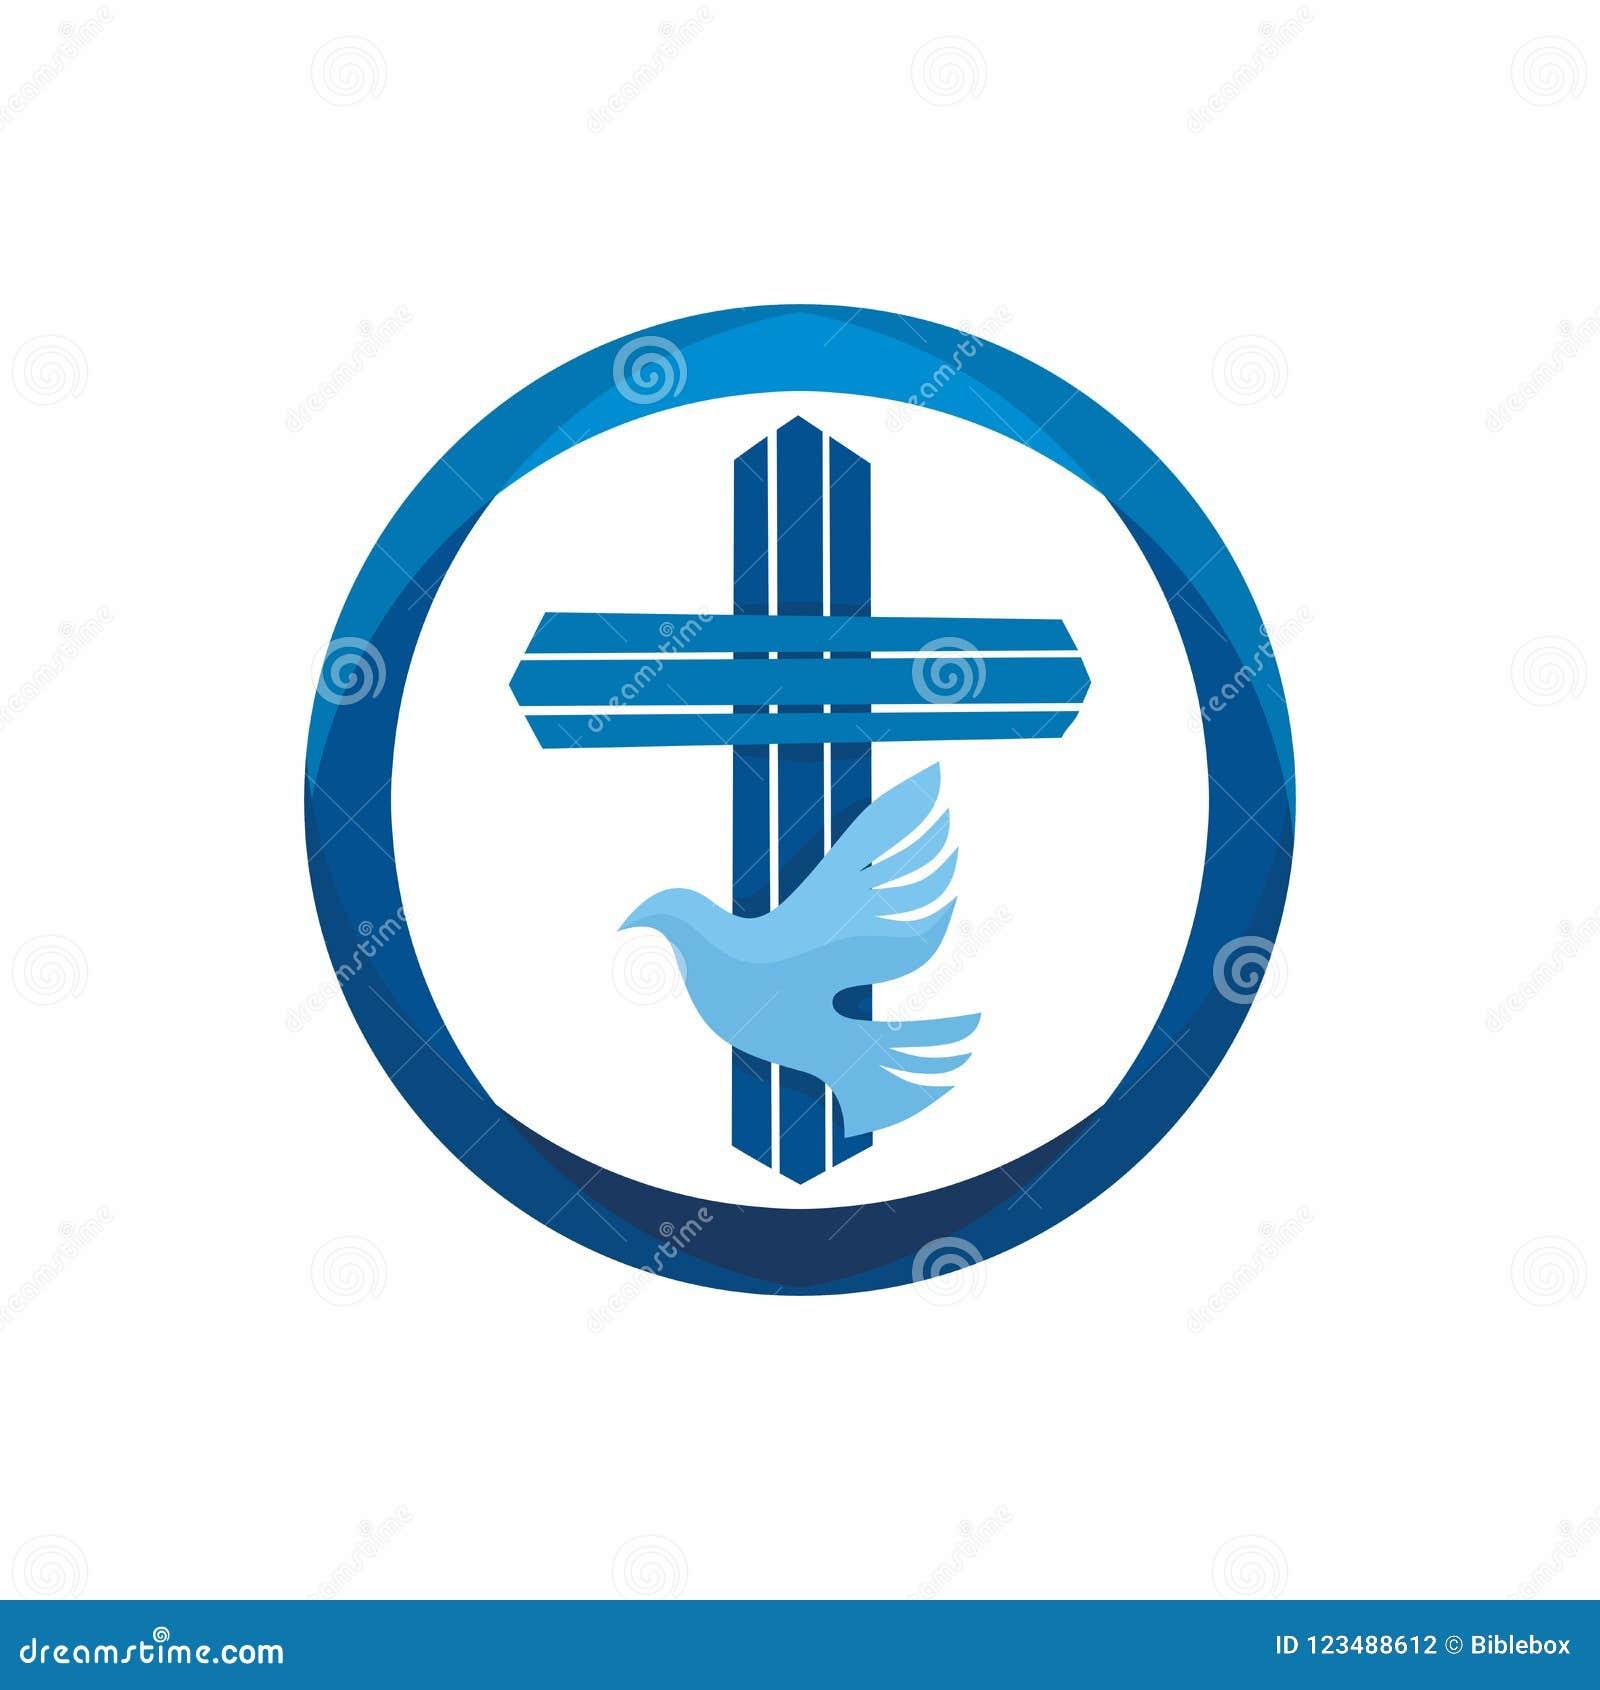 Church Logo Christian Symbols Jesus Cross And Dove The Holy